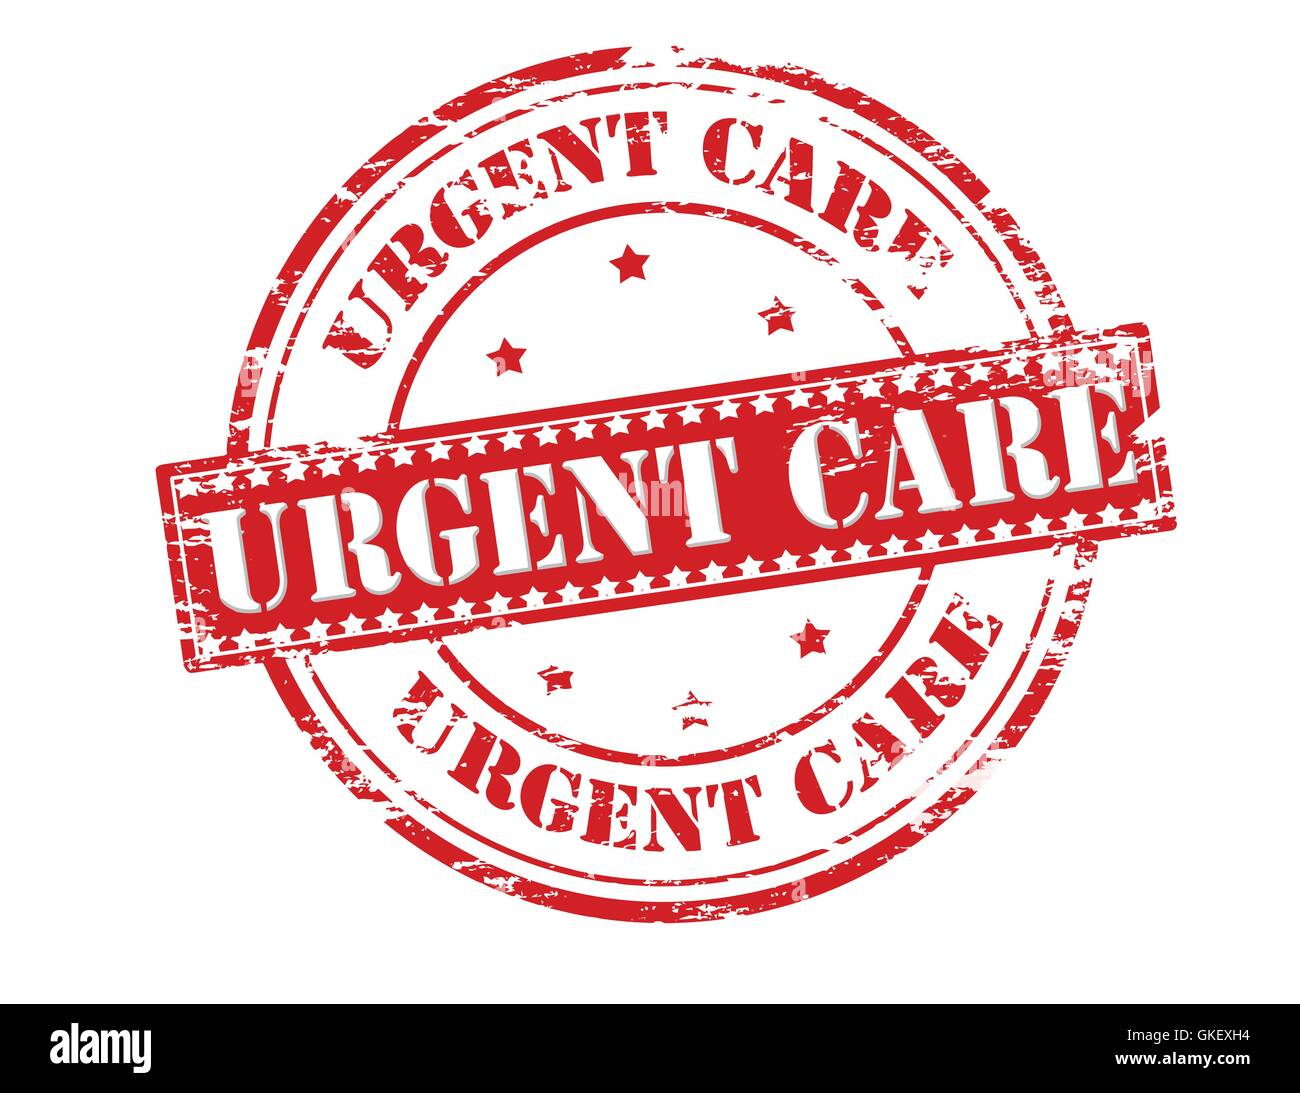 Urgent care - Stock Image